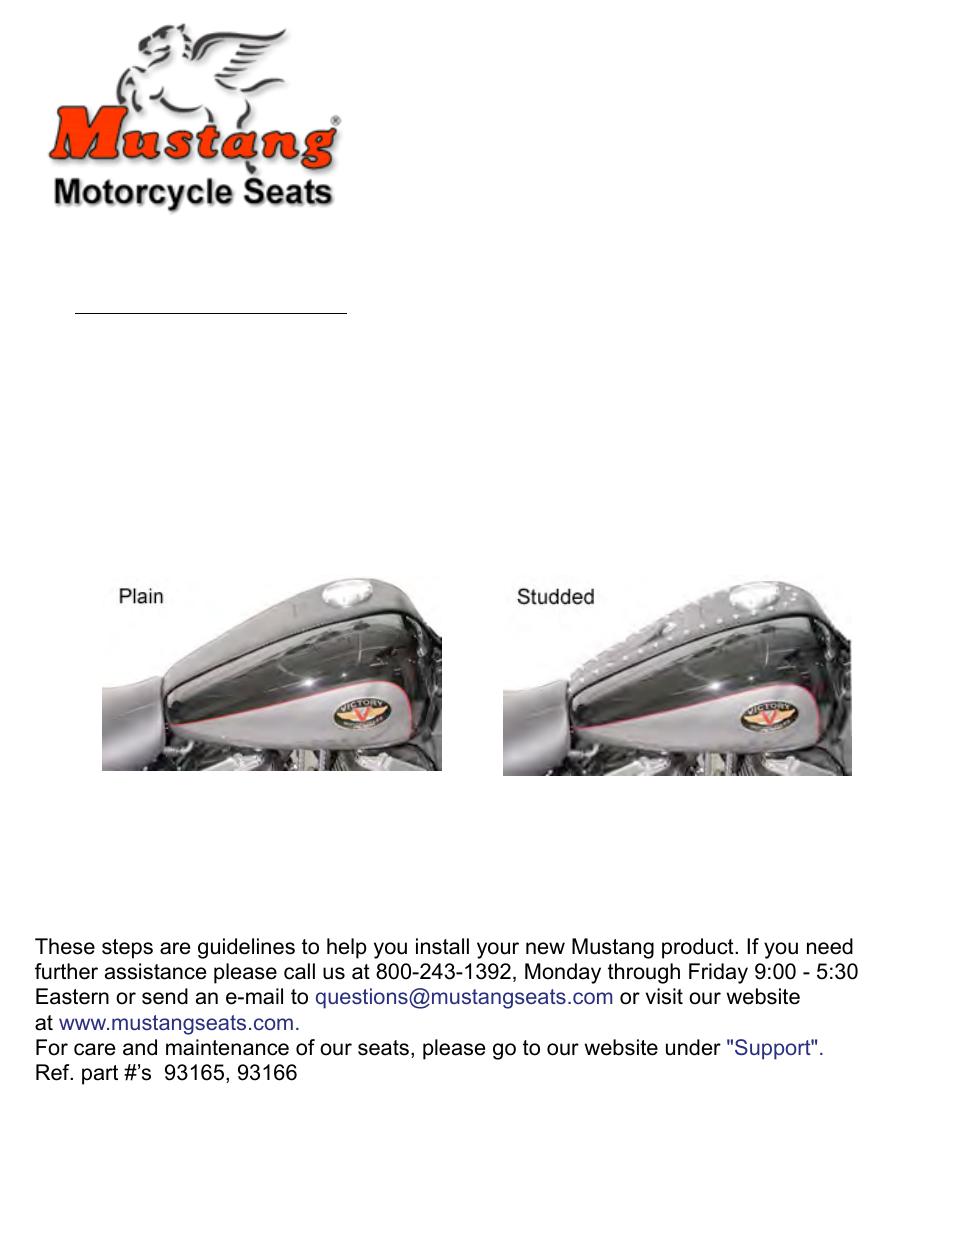 Mustang Motorcycle Seats Studded Tank Bib - Victory V92C User Manual | 1  page